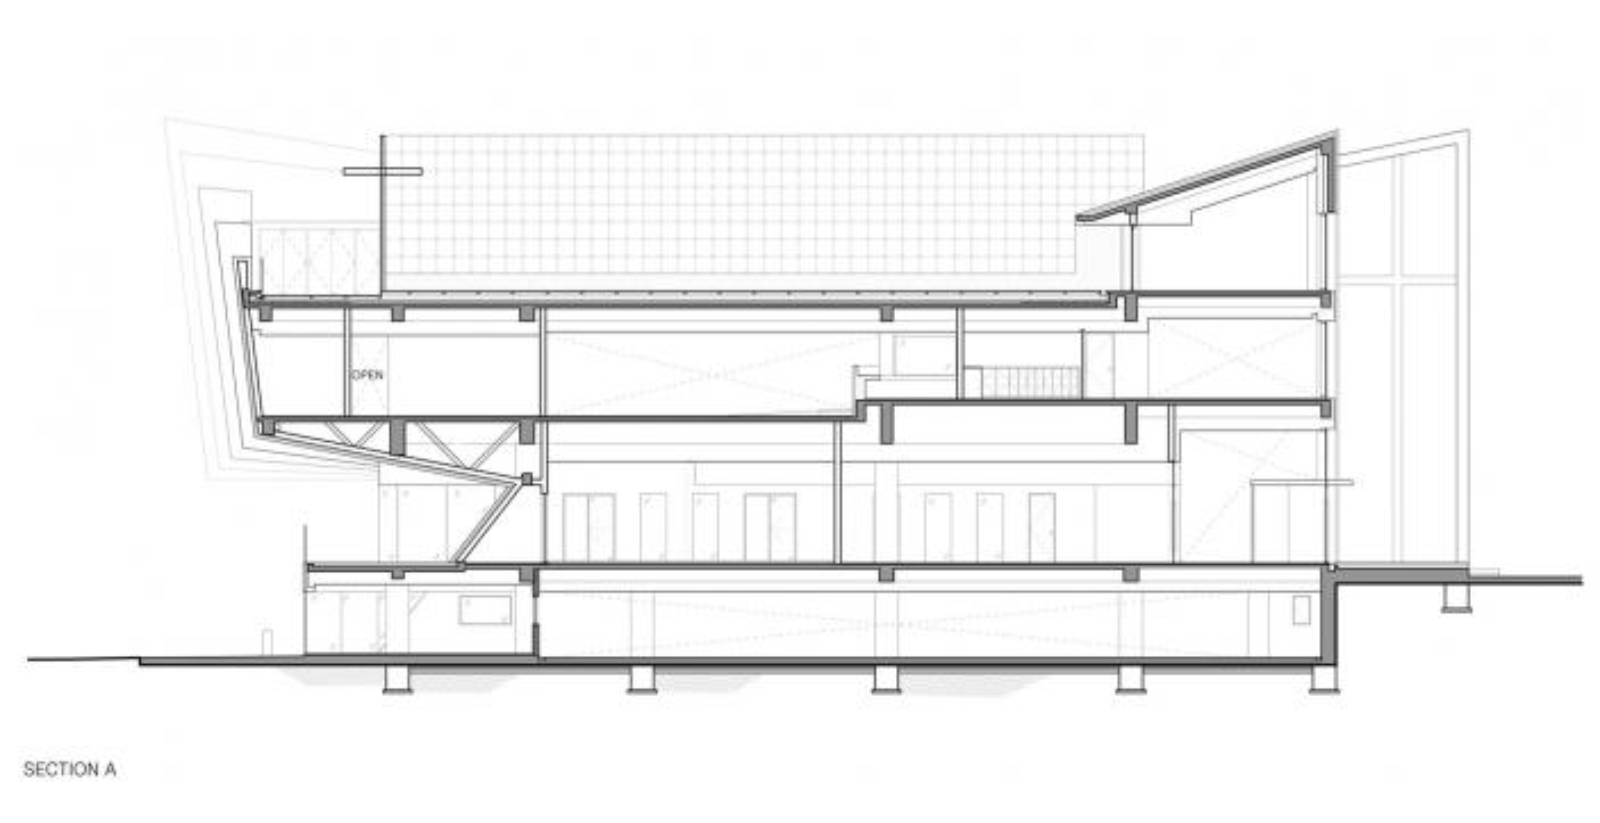 pc church design by theeae 13 pc church design by theeae